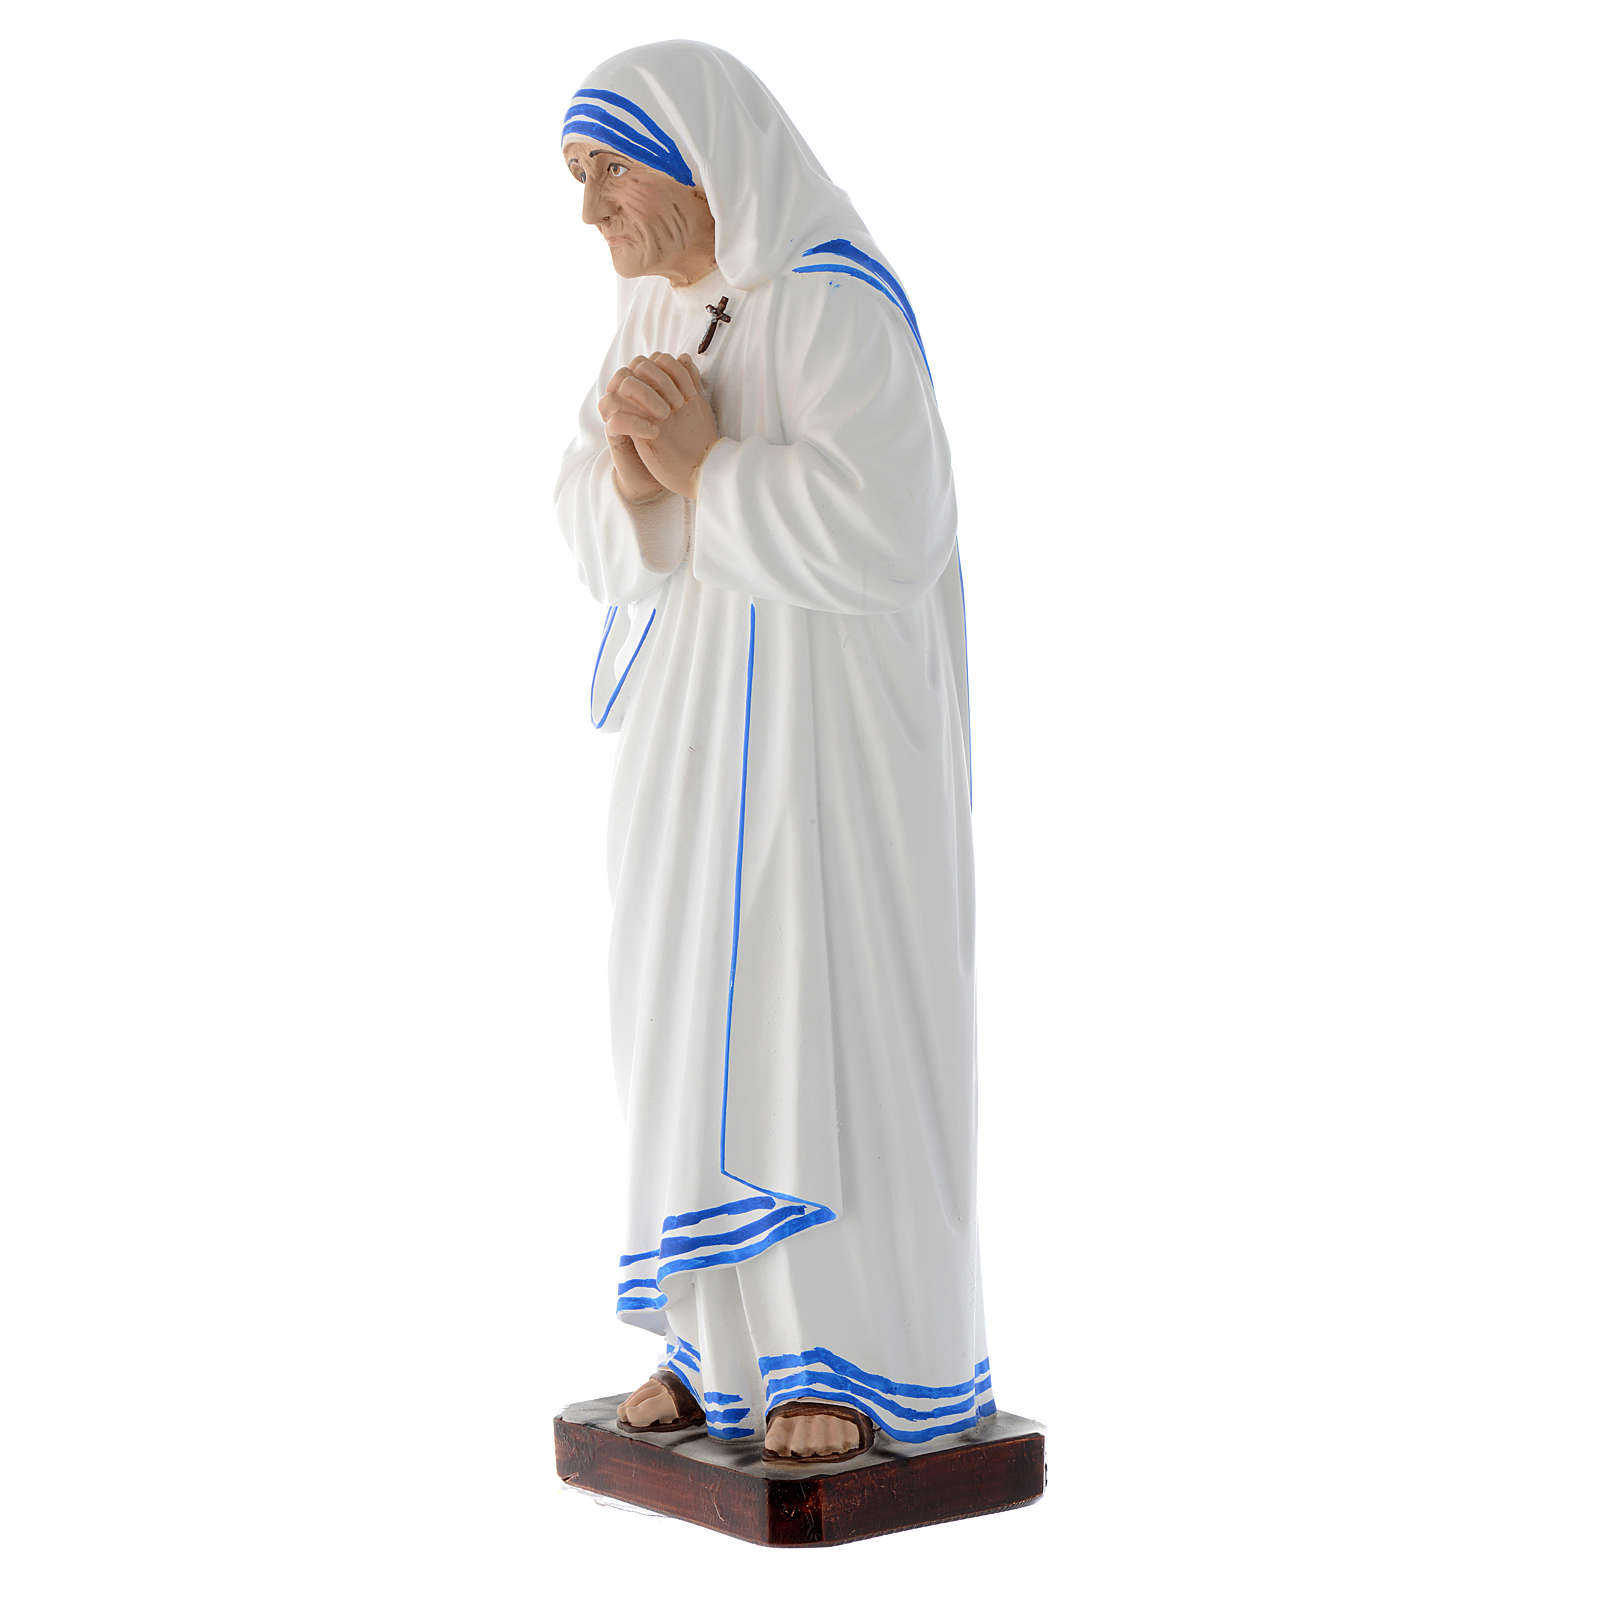 Statue Sainte Mère Teresa de Calcutta 30 cm fibre de verre 4